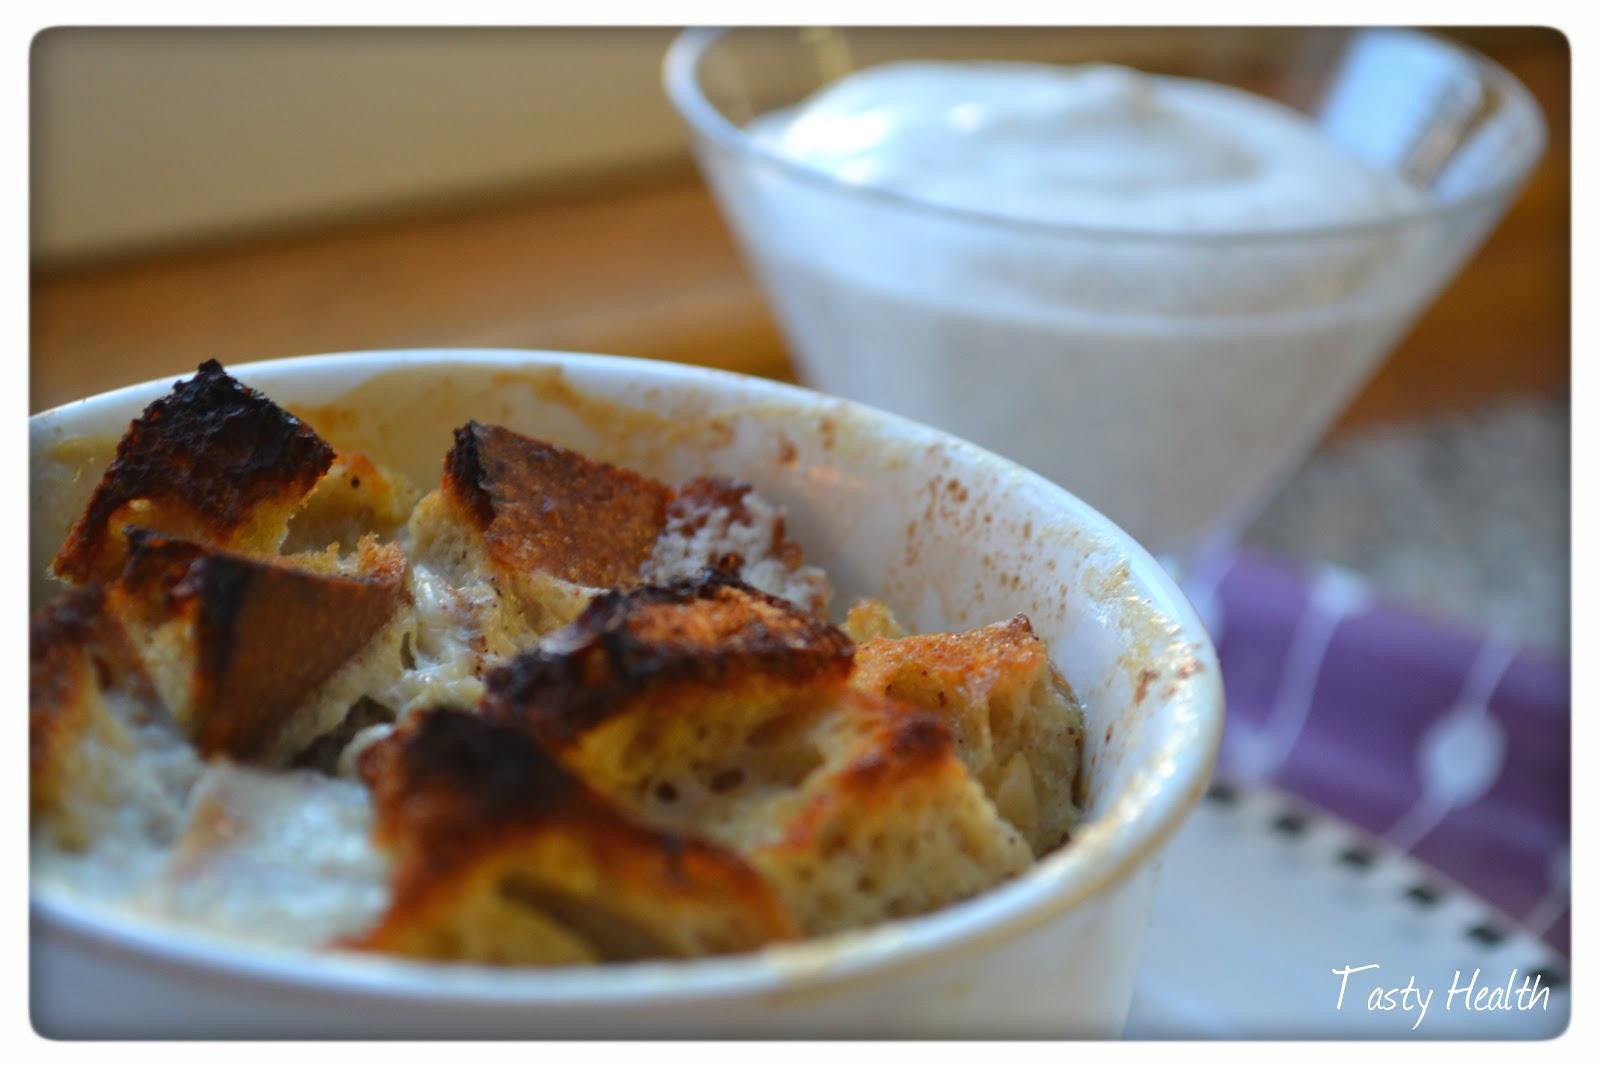 tasty health äpple kanel brödpudding med vaniljkräm